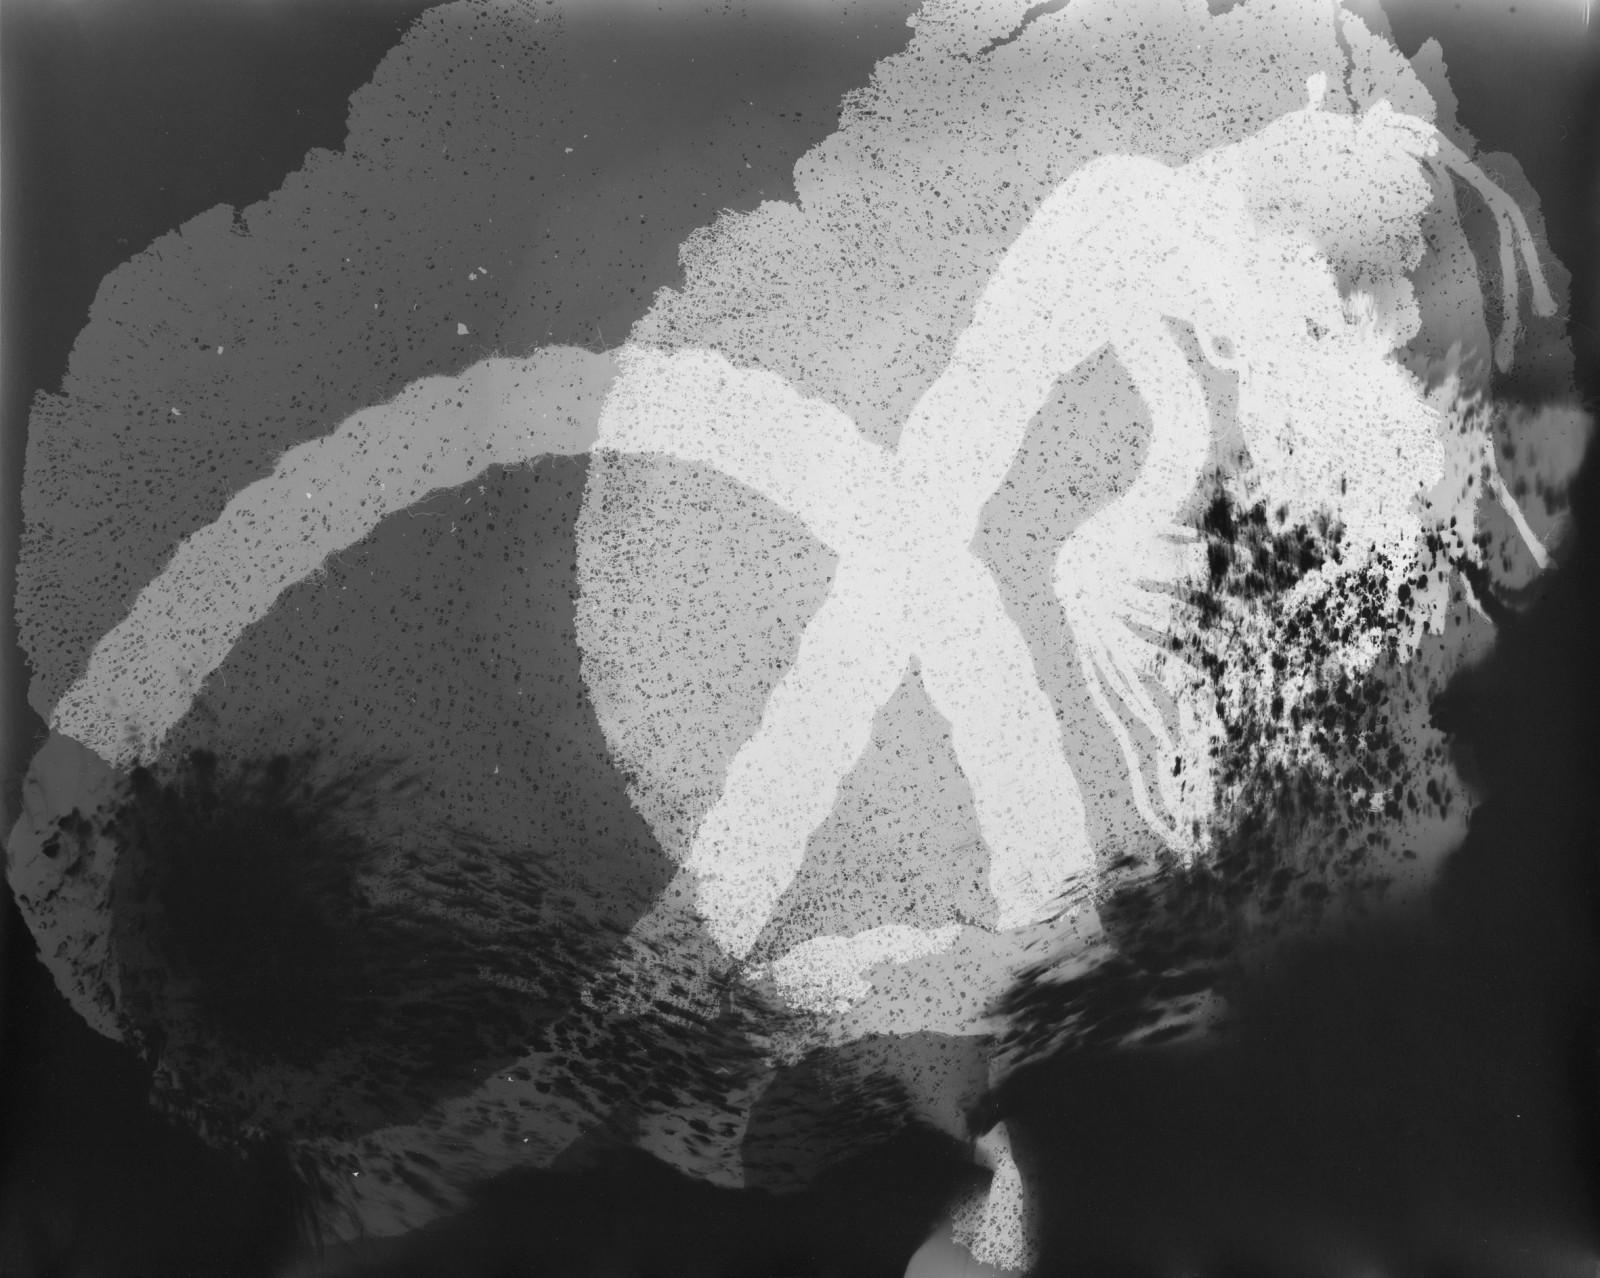 Kim Nekarda: tête, 2012, photogram on baryta paper, 40 x 53 cm